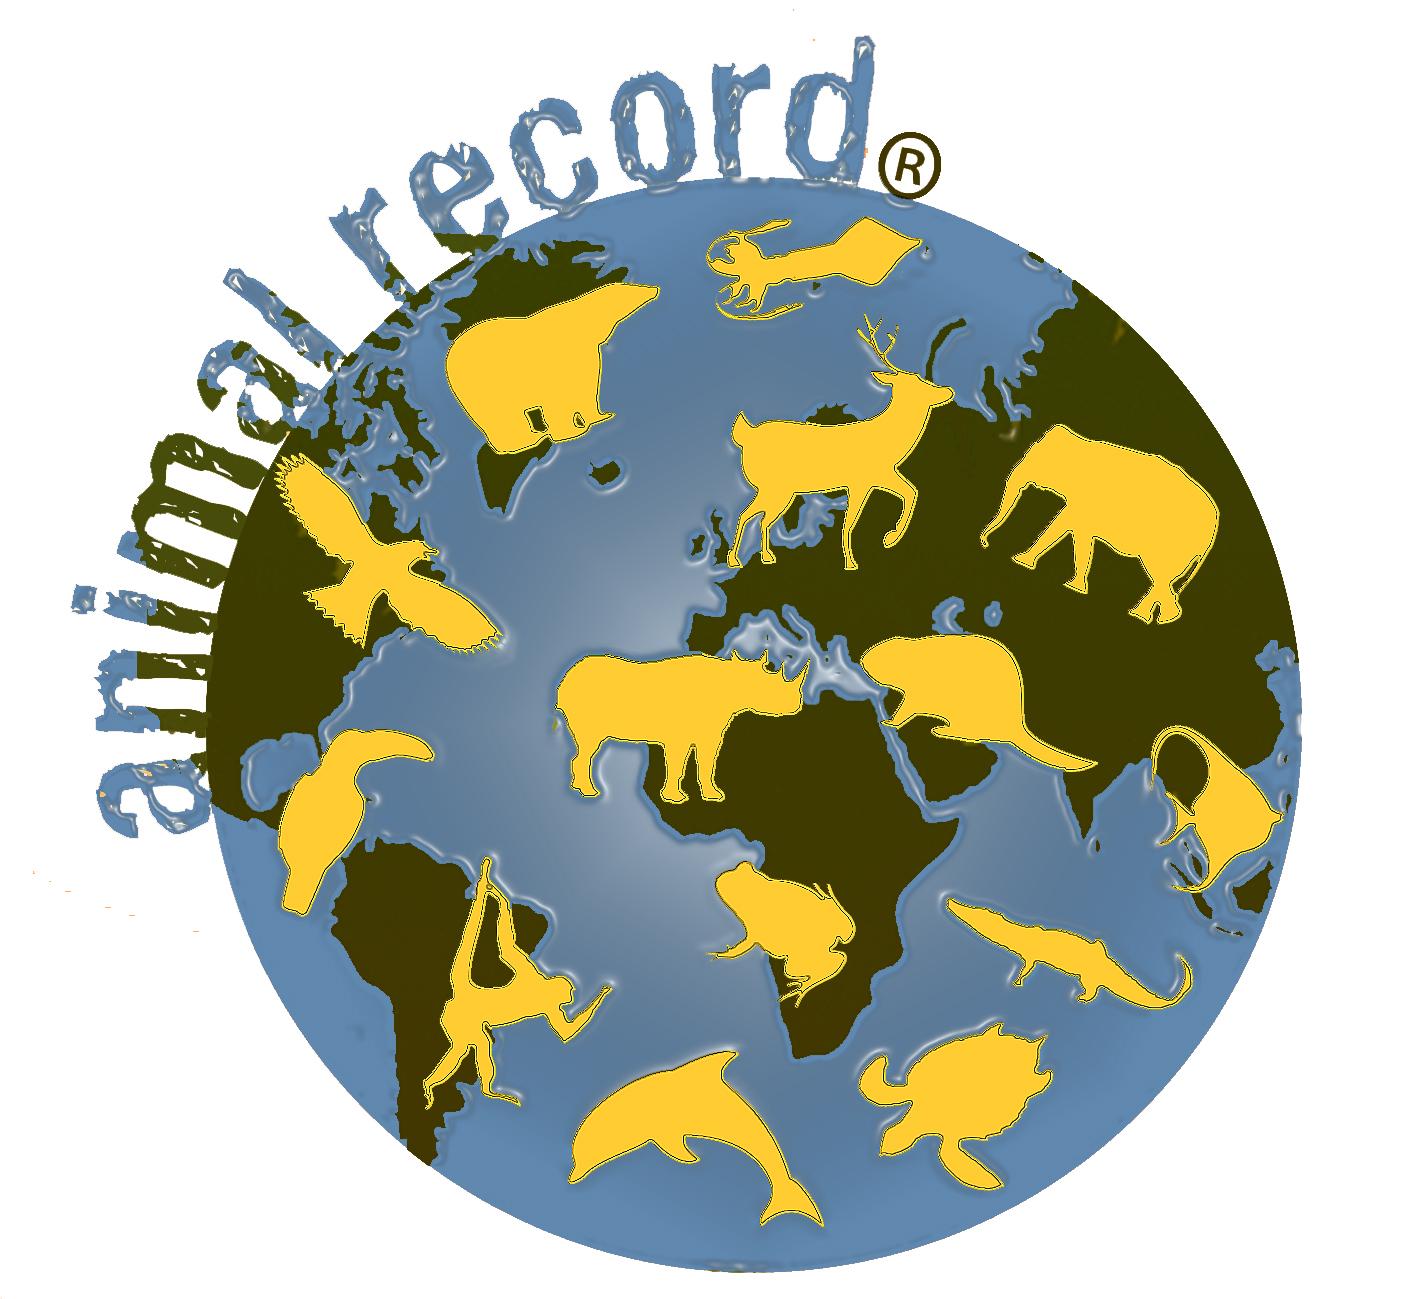 LOGO ANIMAL RECORD ®